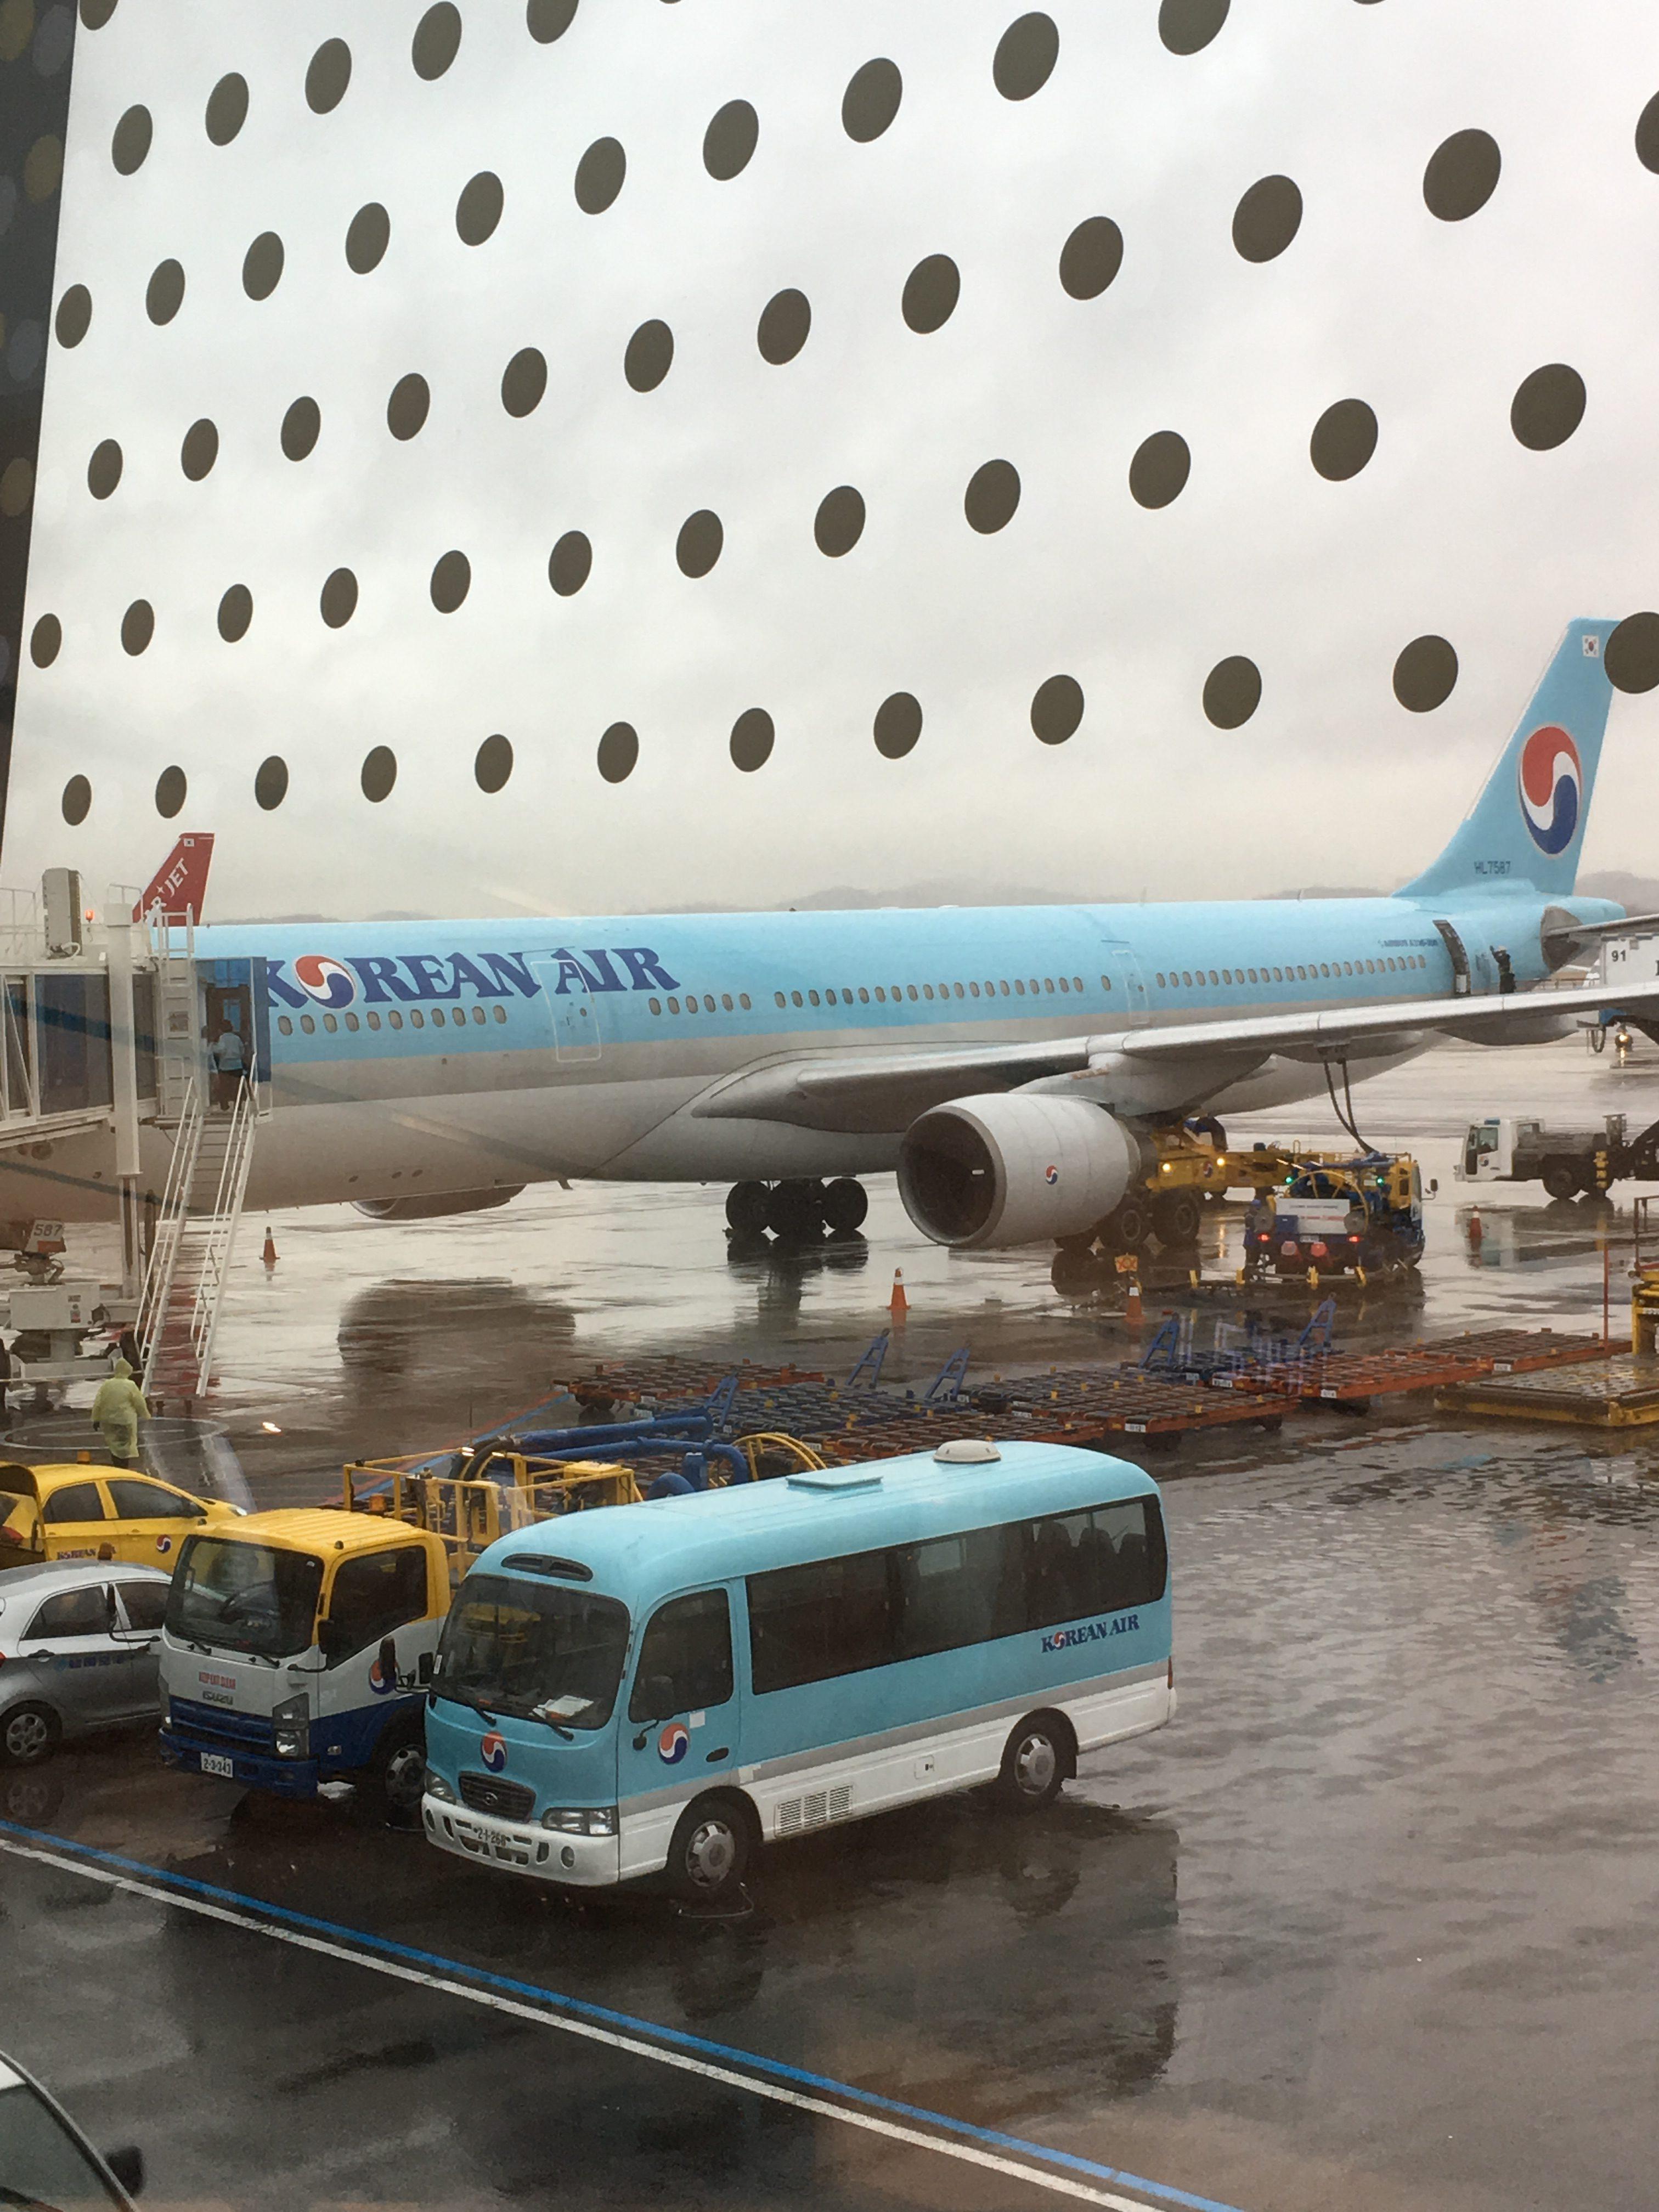 Korean Air Customer Reviews | SKYTRAX